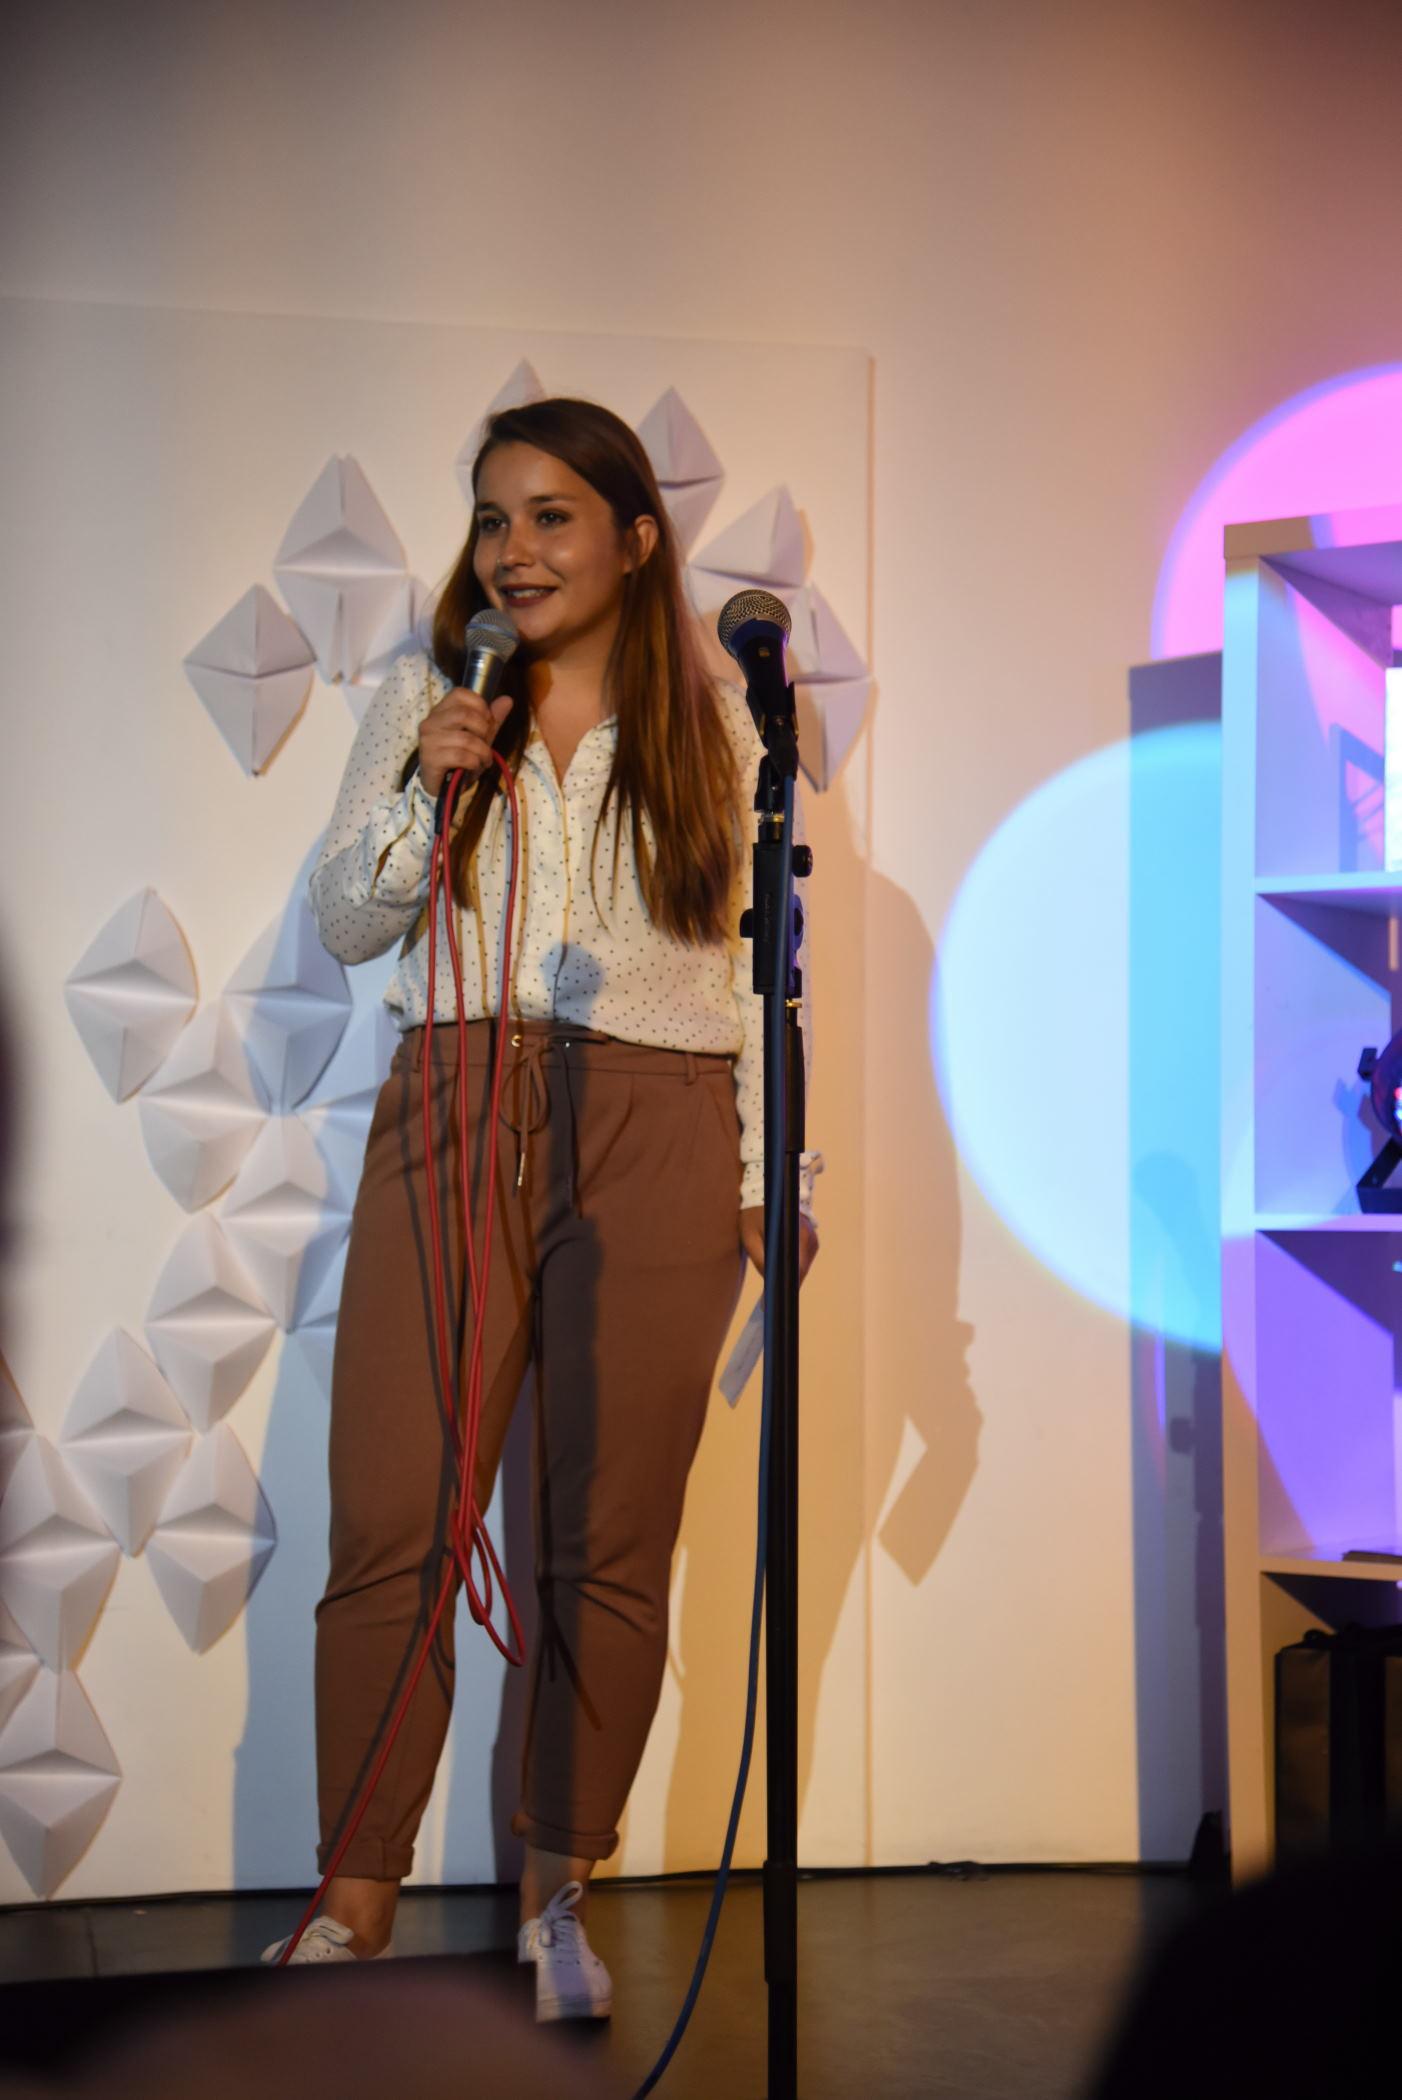 MEM-Studierende Polina Bragina moderierte den Slam - markige Sprüche inklusive.